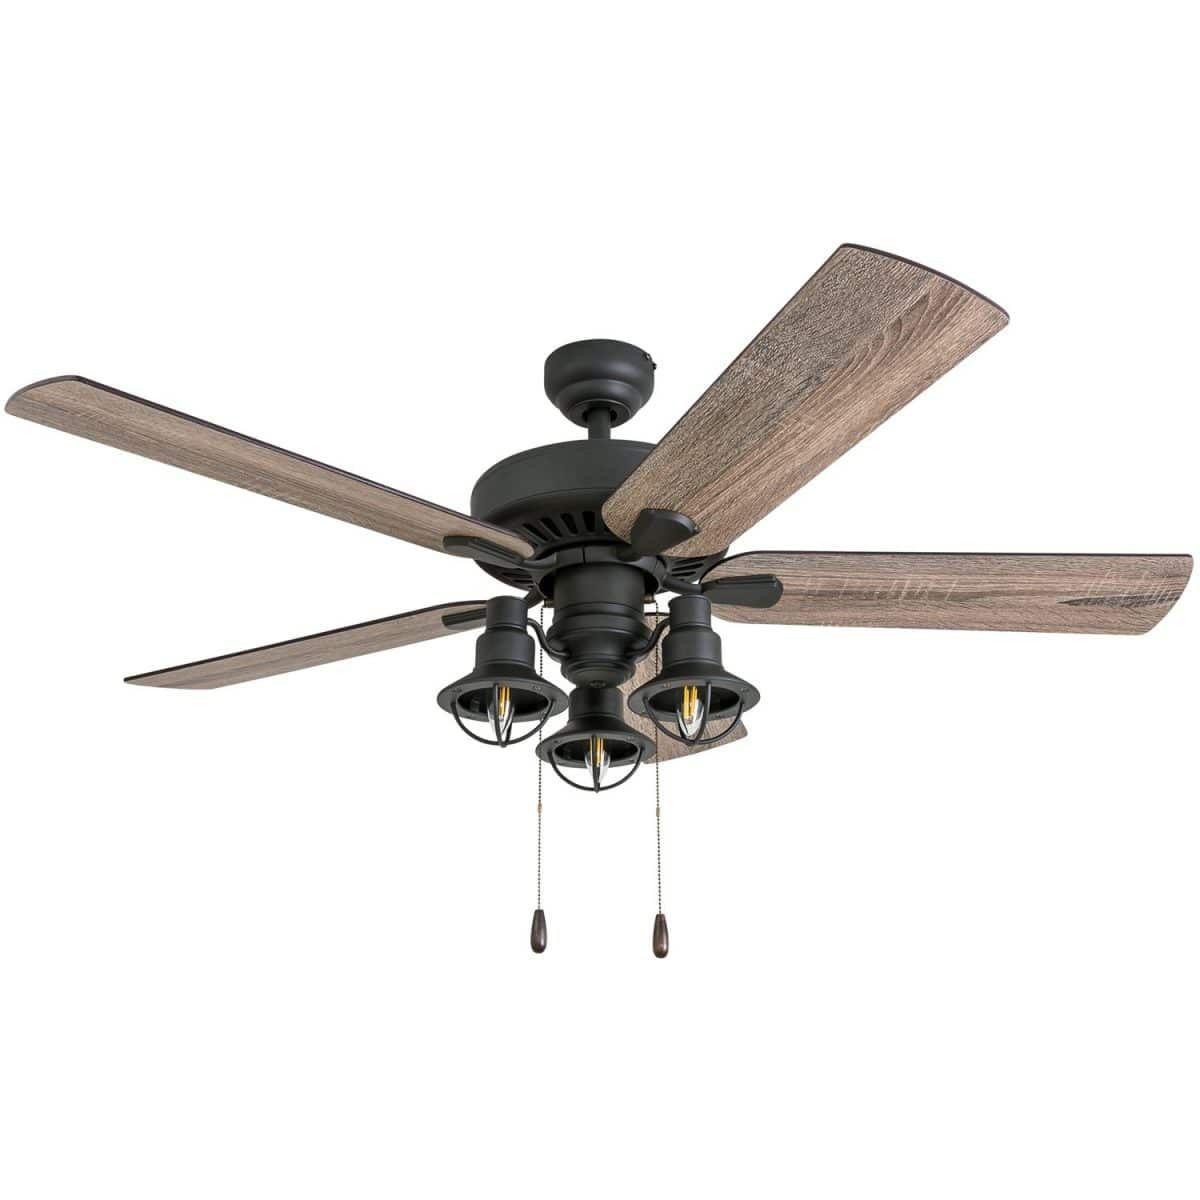 farmhouse ceiling fan with light 42 inch